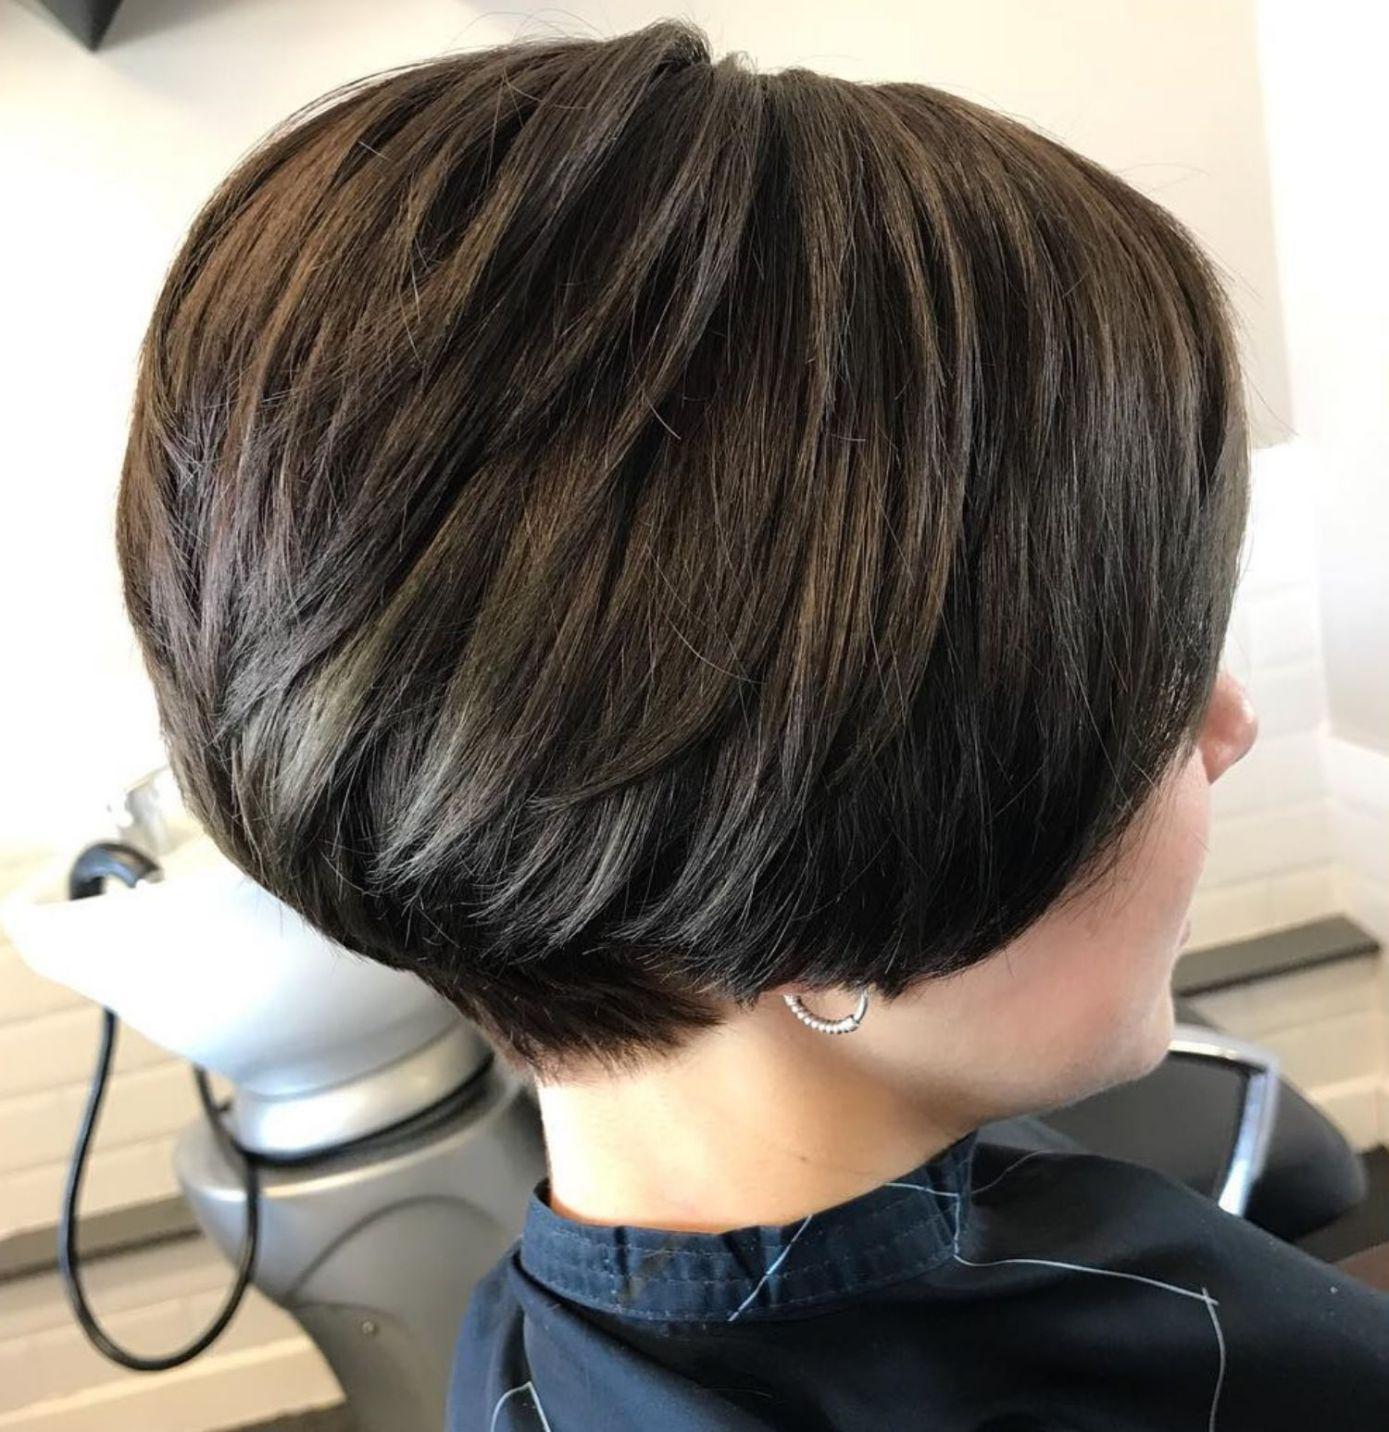 classy short haircuts and hairstyles for thick hair kiểu tóc